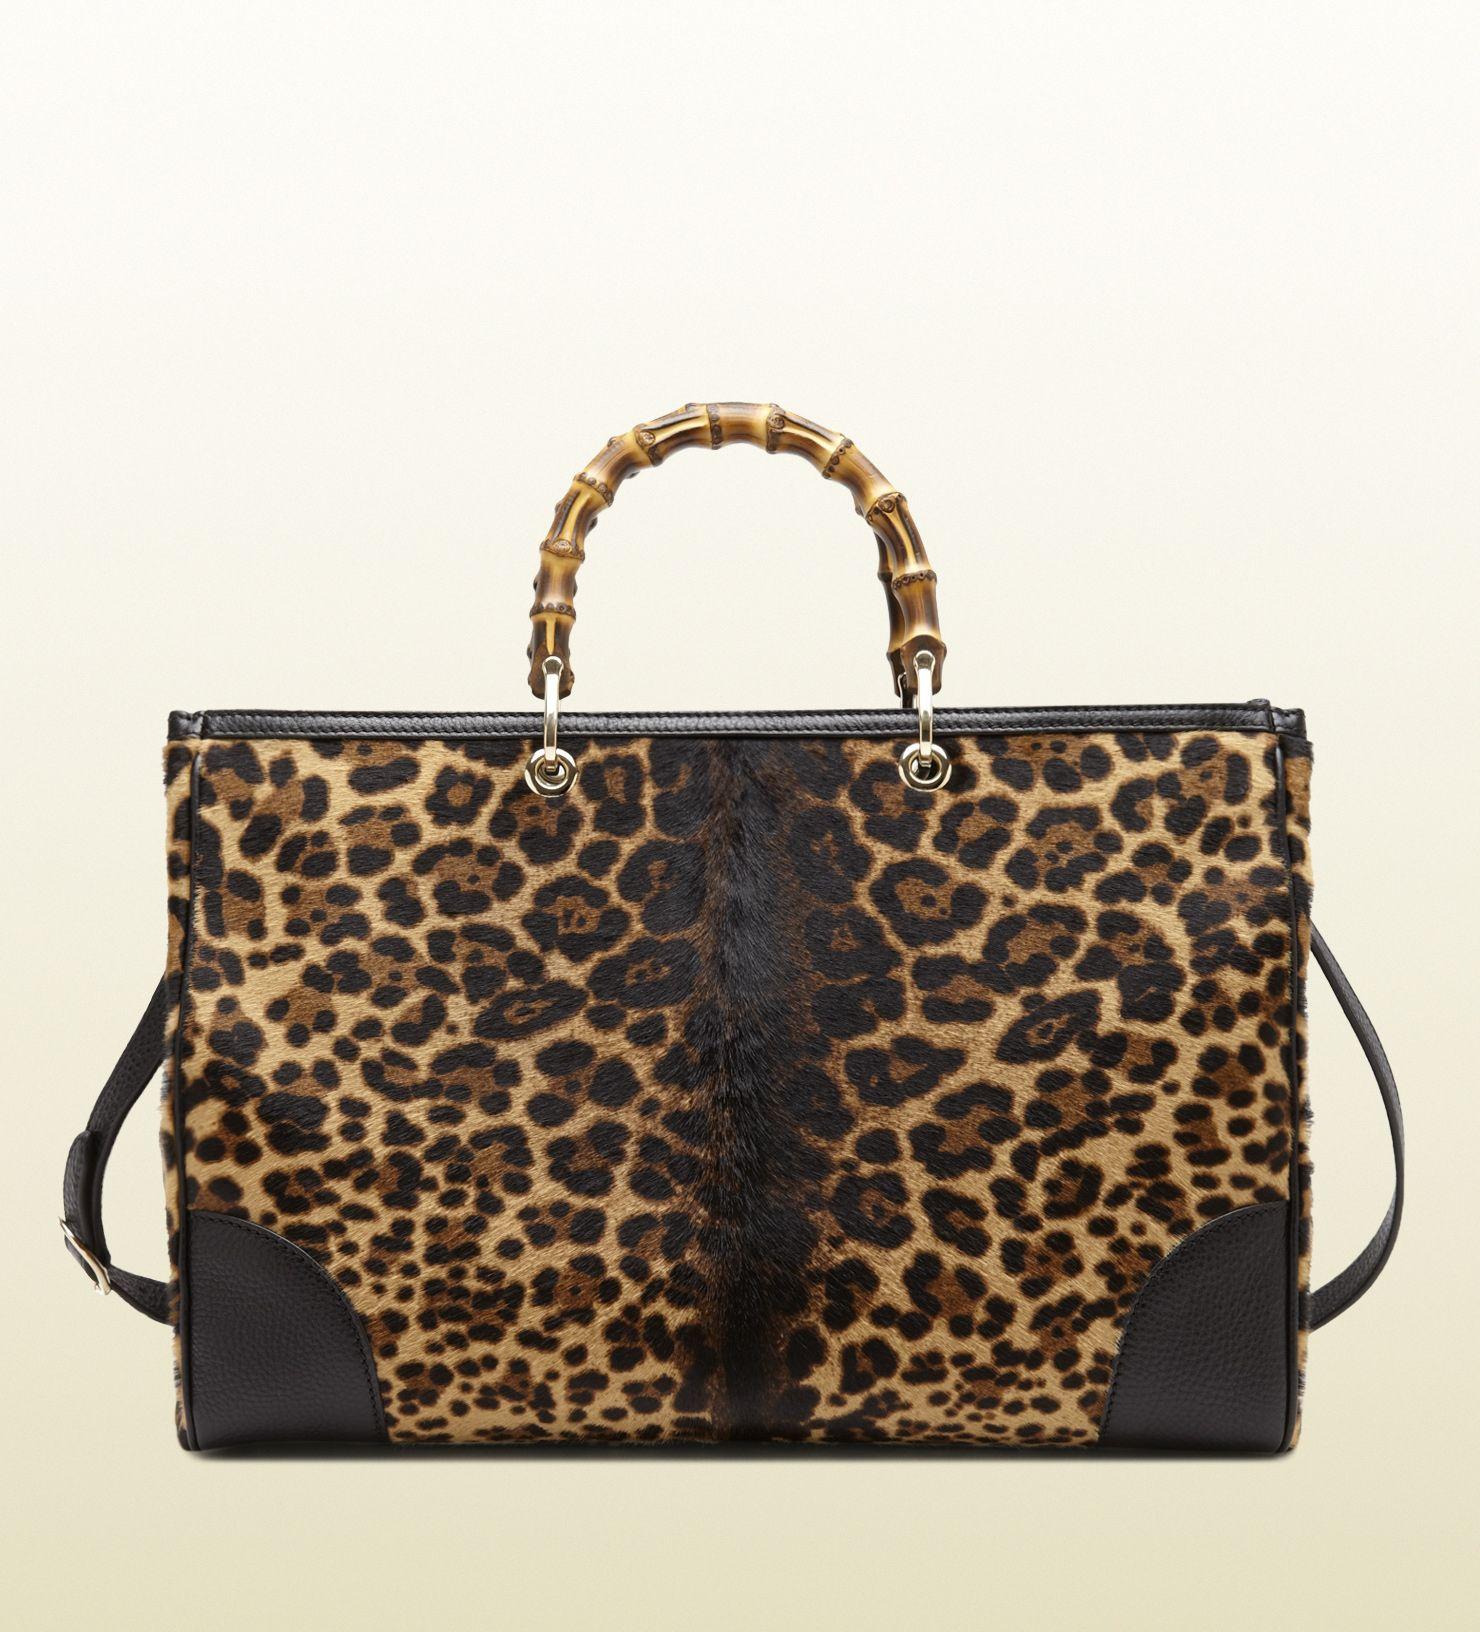 jaguar product alligator croc vintage tod brand page purses s handbag file handbags crocodile butterscotch purse